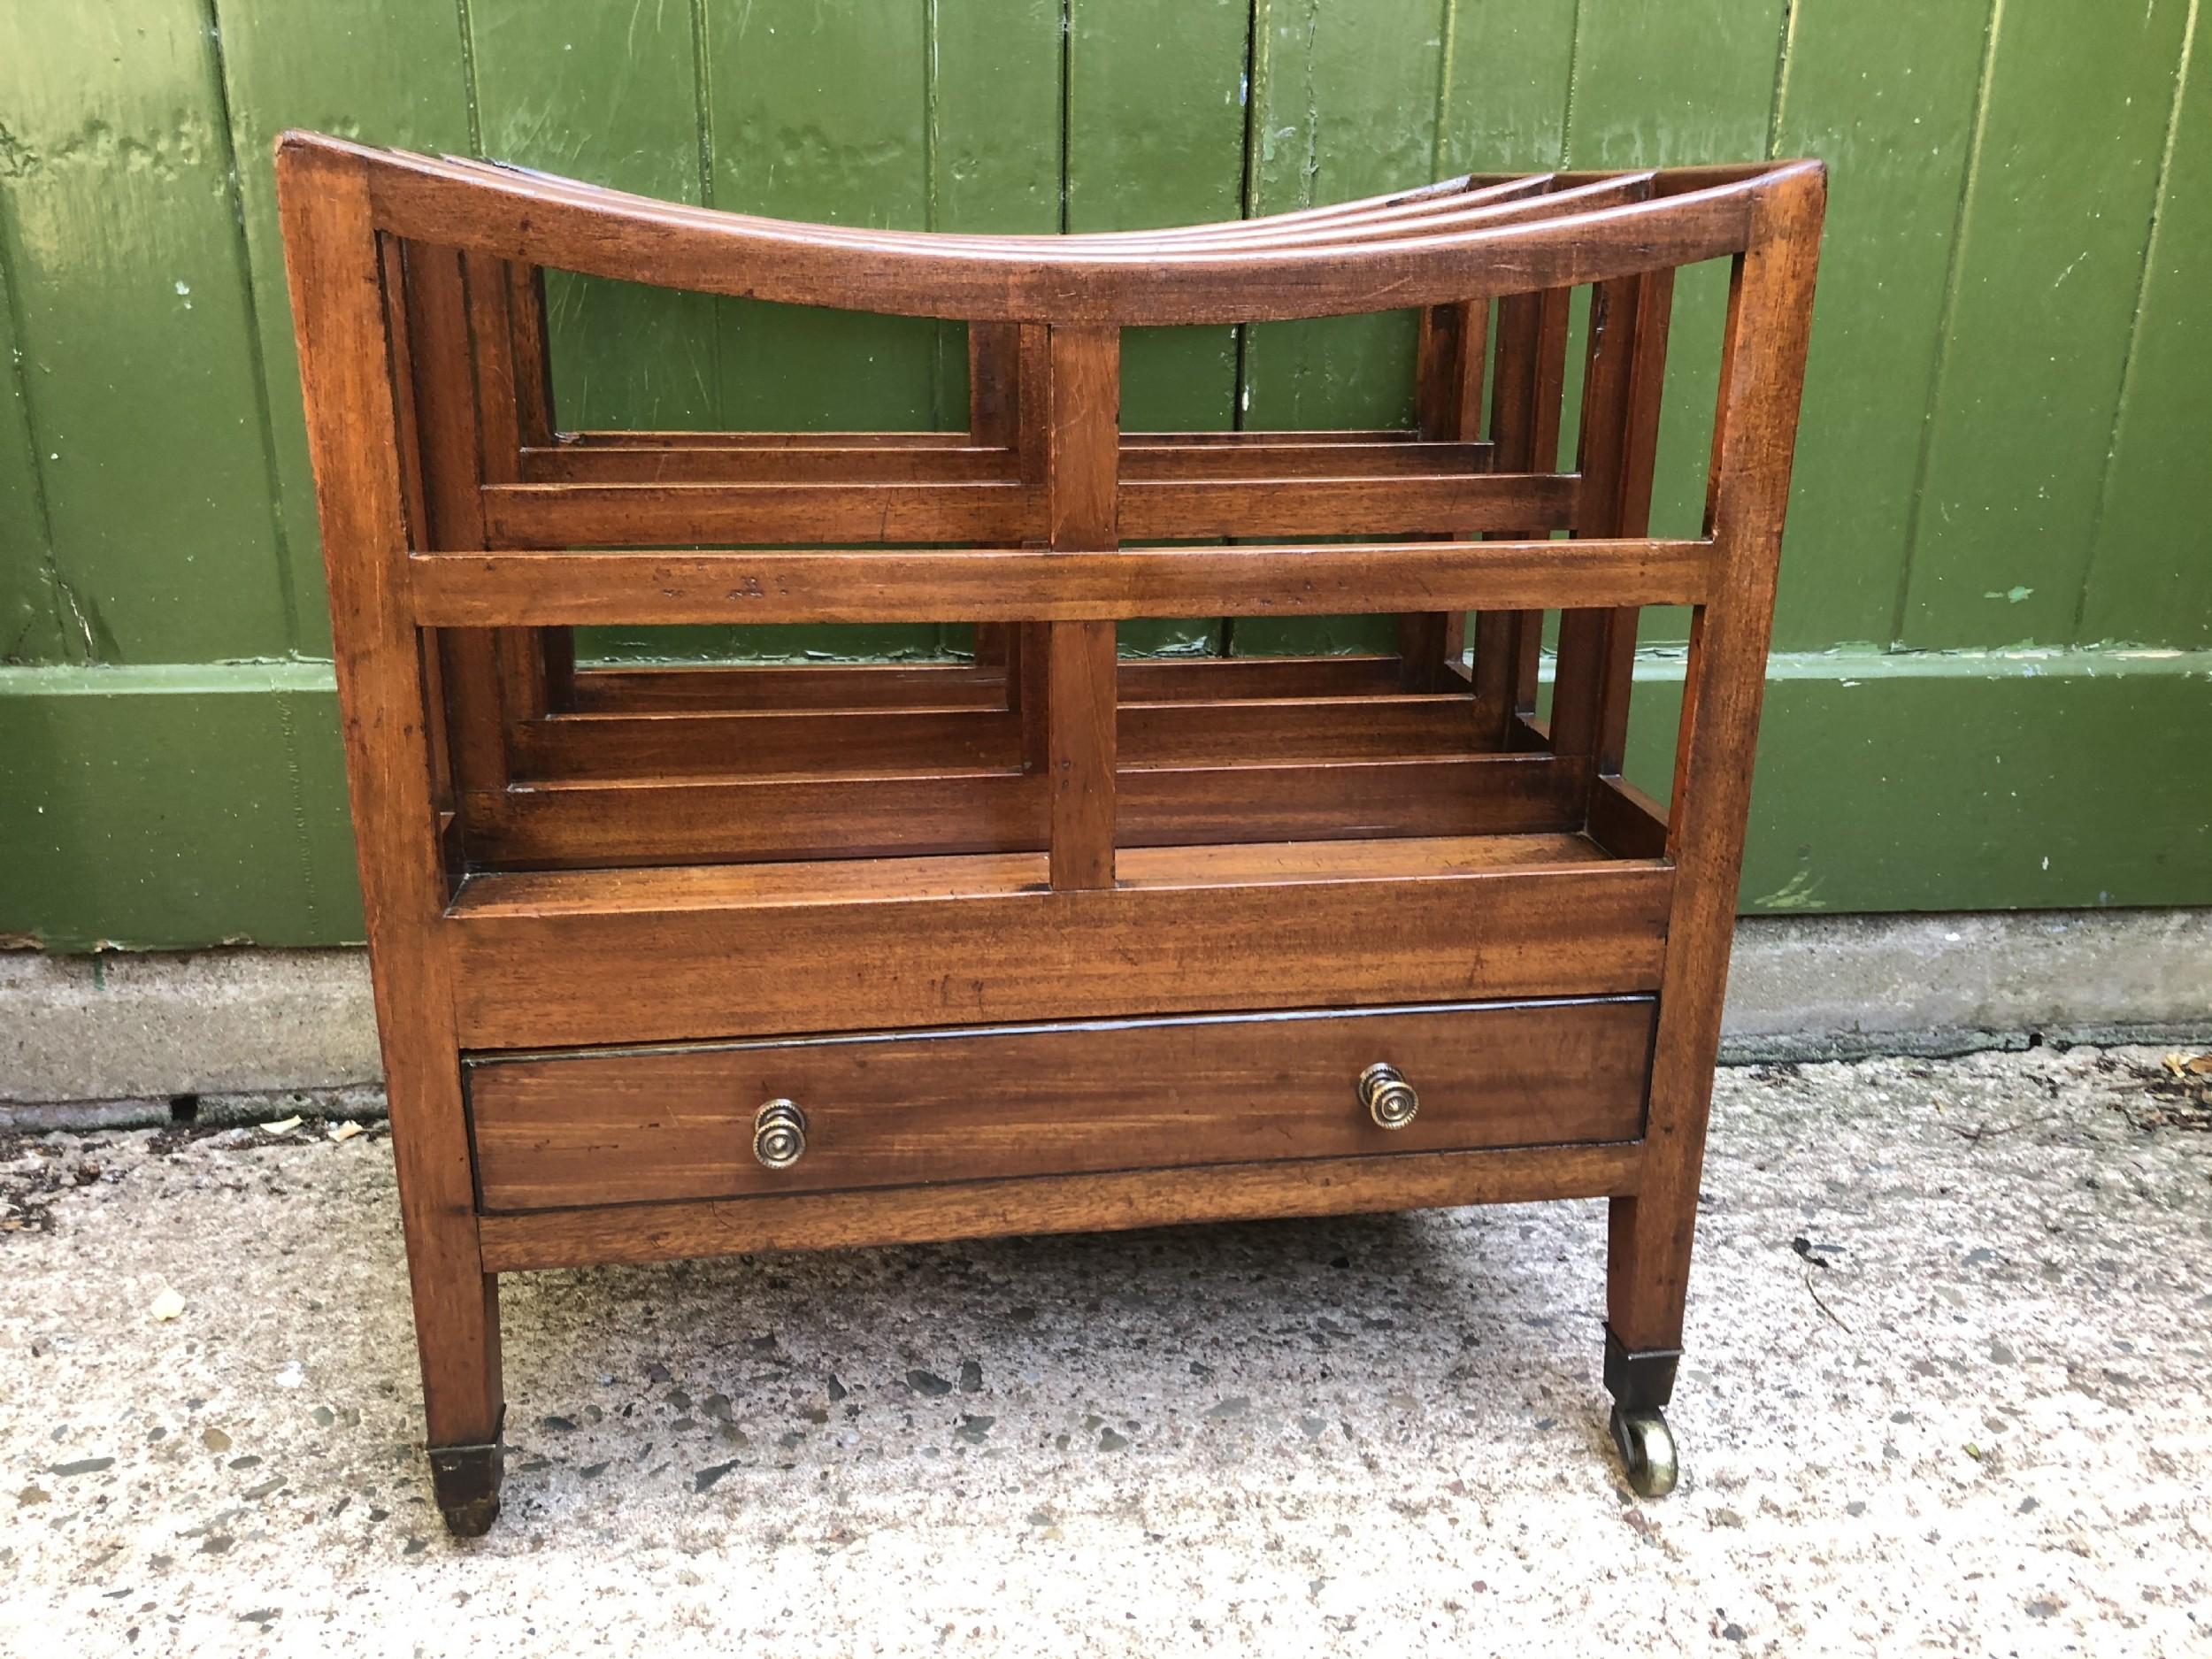 early c19th late george iii period mahogany canterbury or magazine rack